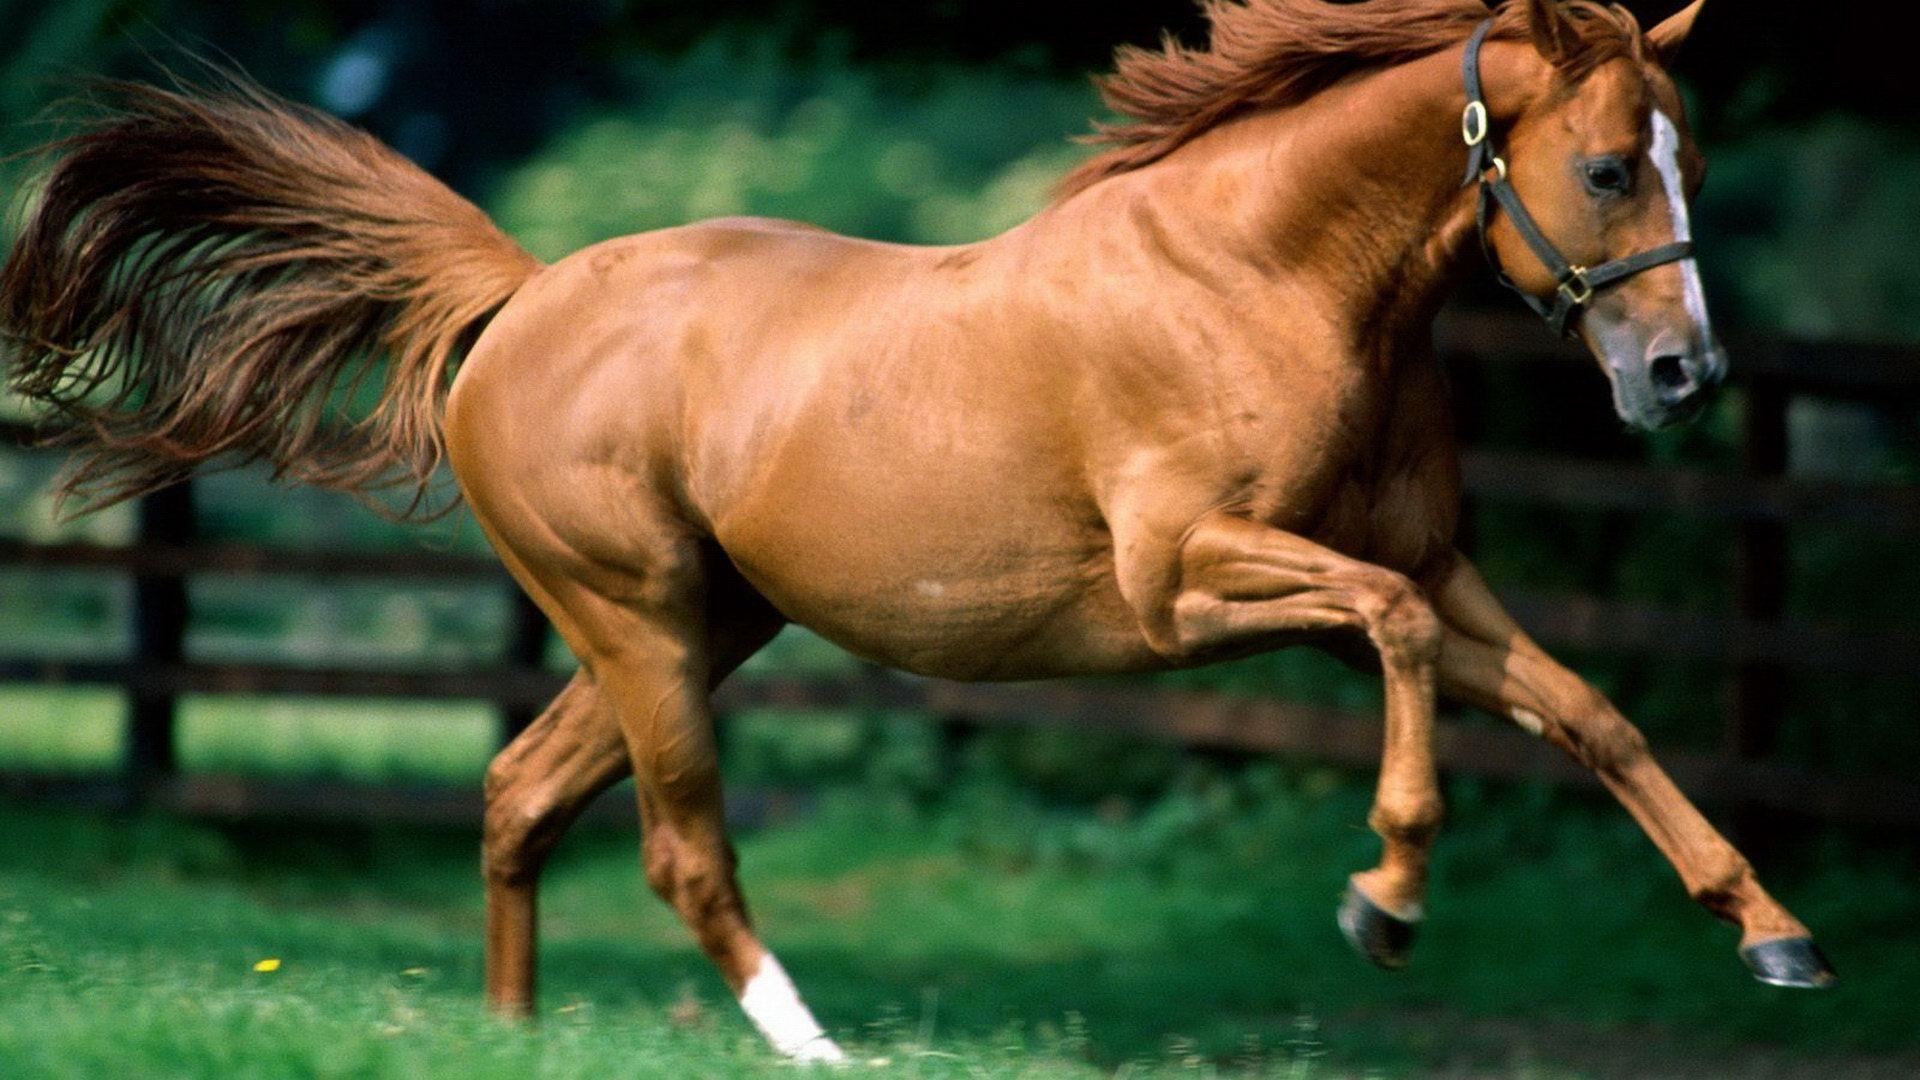 Simple Wallpaper Horse Flicka - a7bd81875c63cb879d8783be95c09305  Pictures_488160.jpg